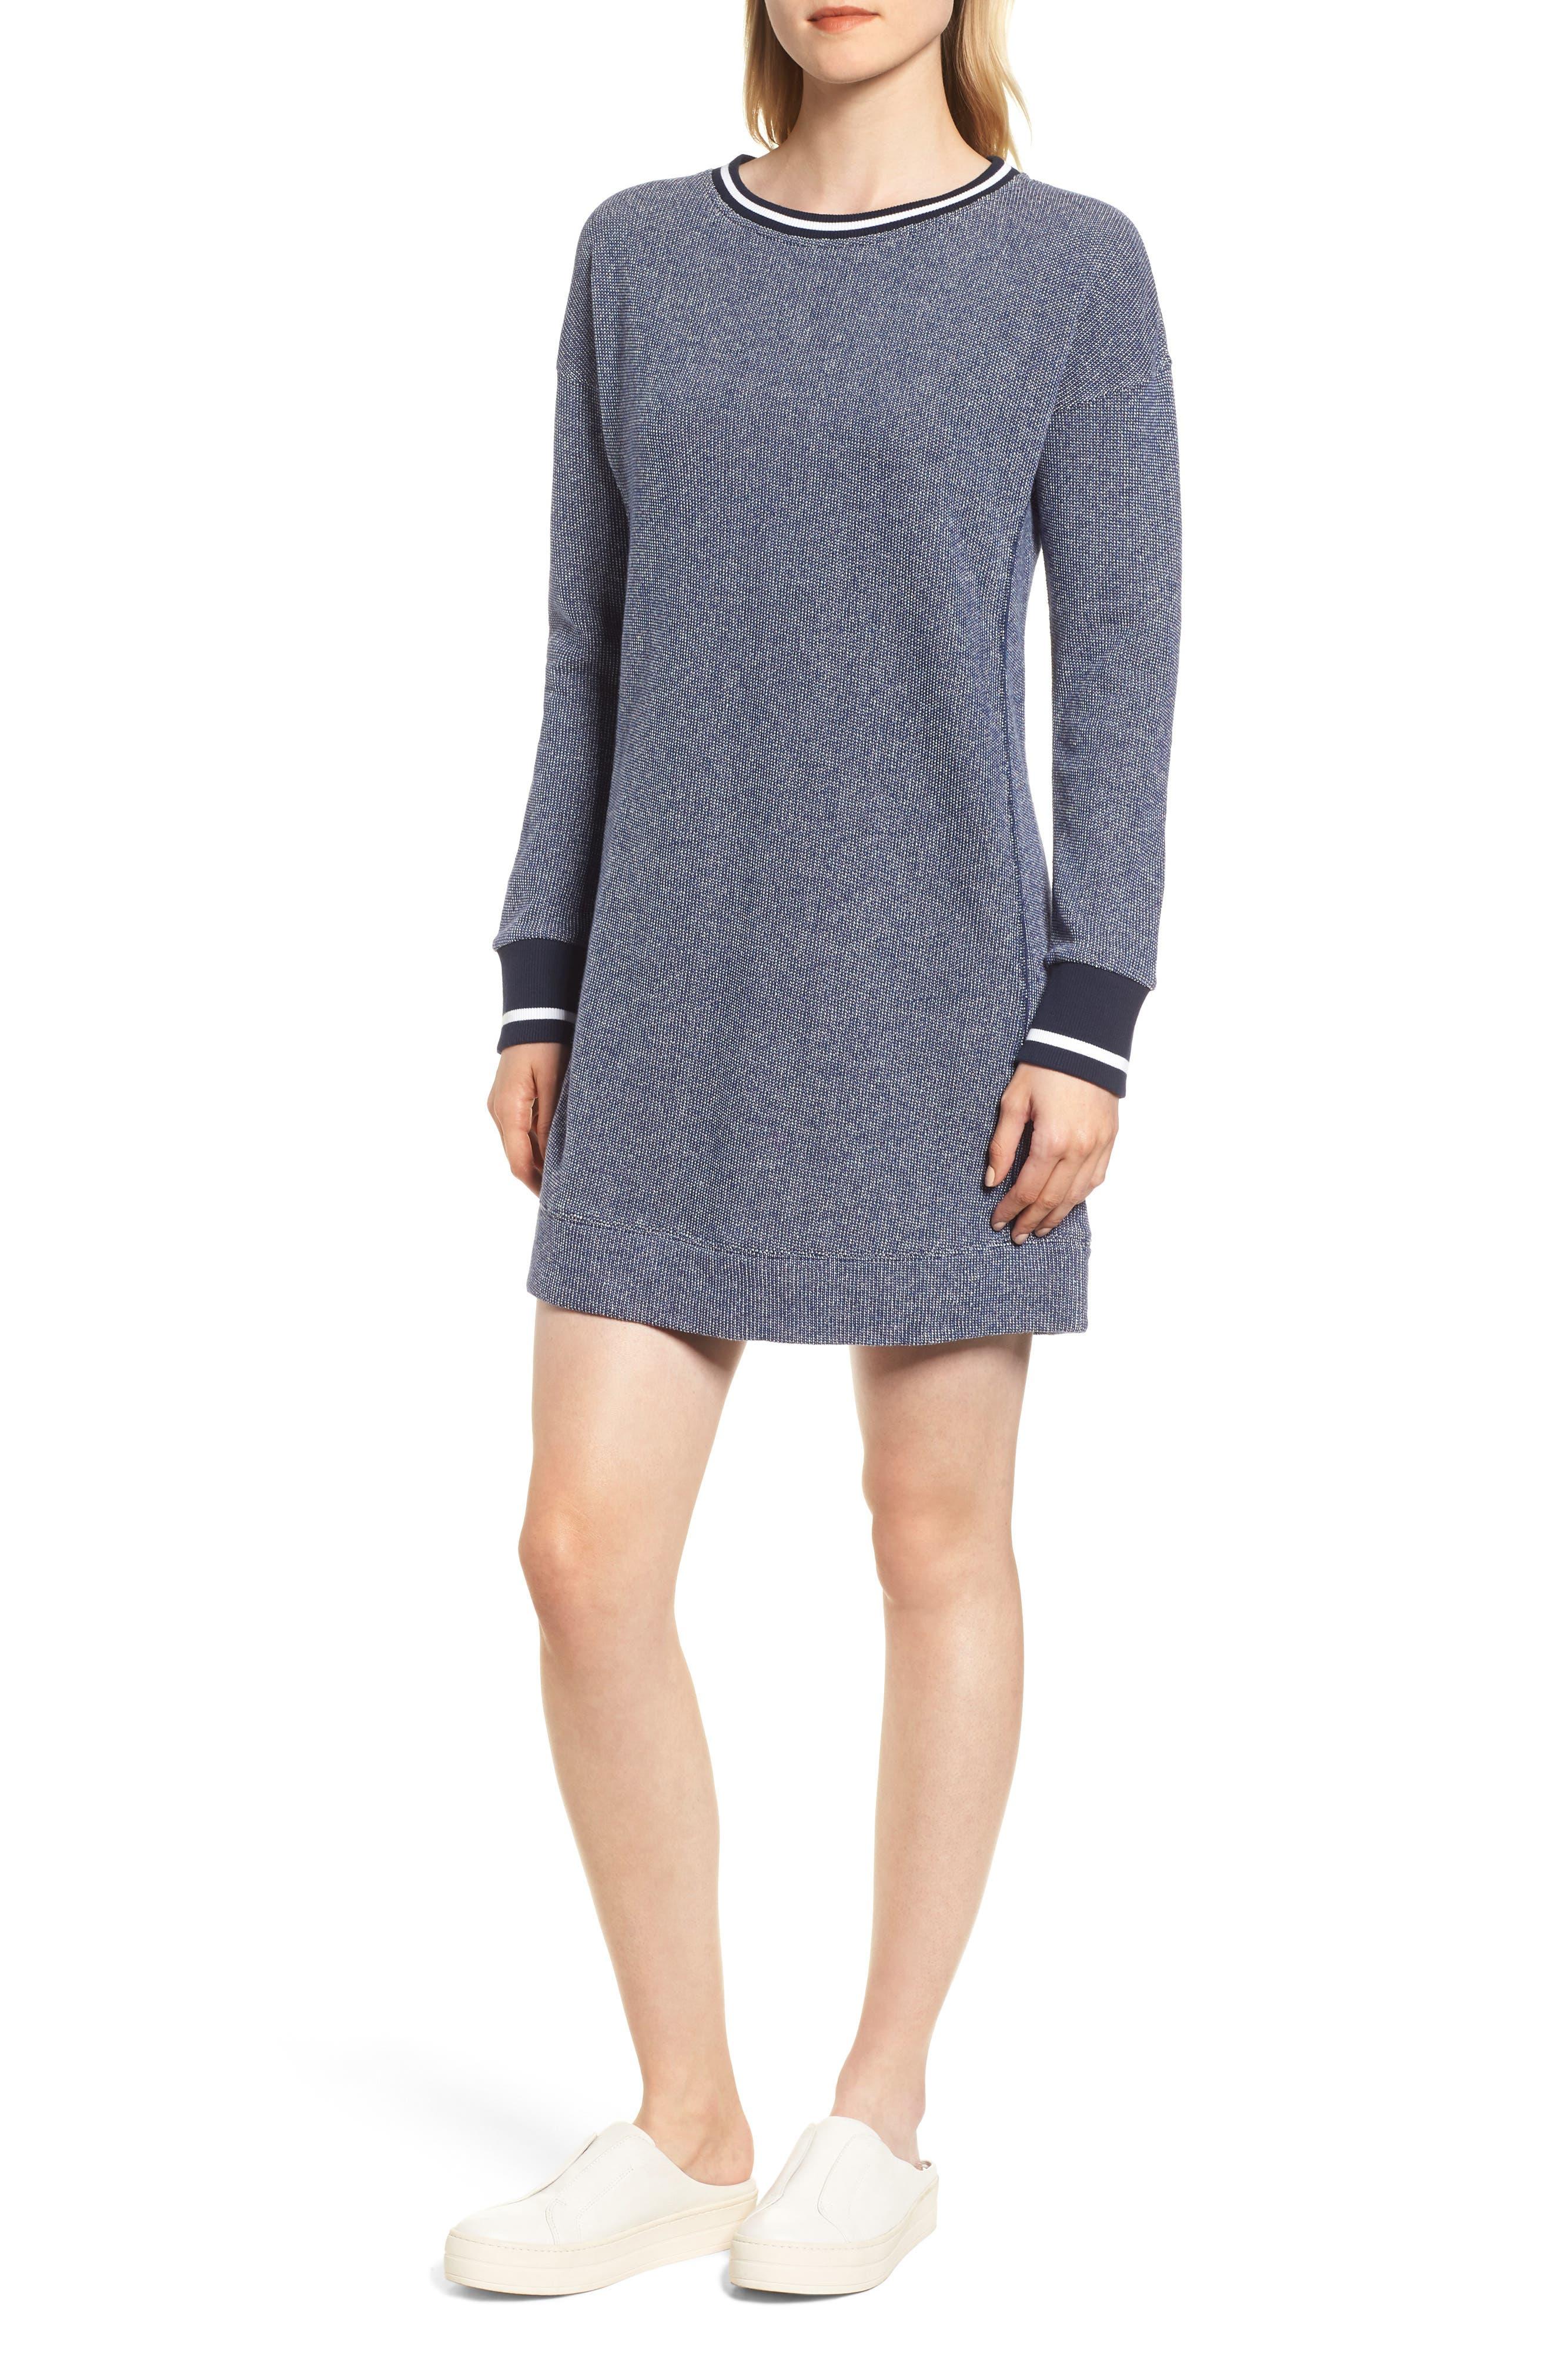 Sweatshirt Dress,                         Main,                         color, 476